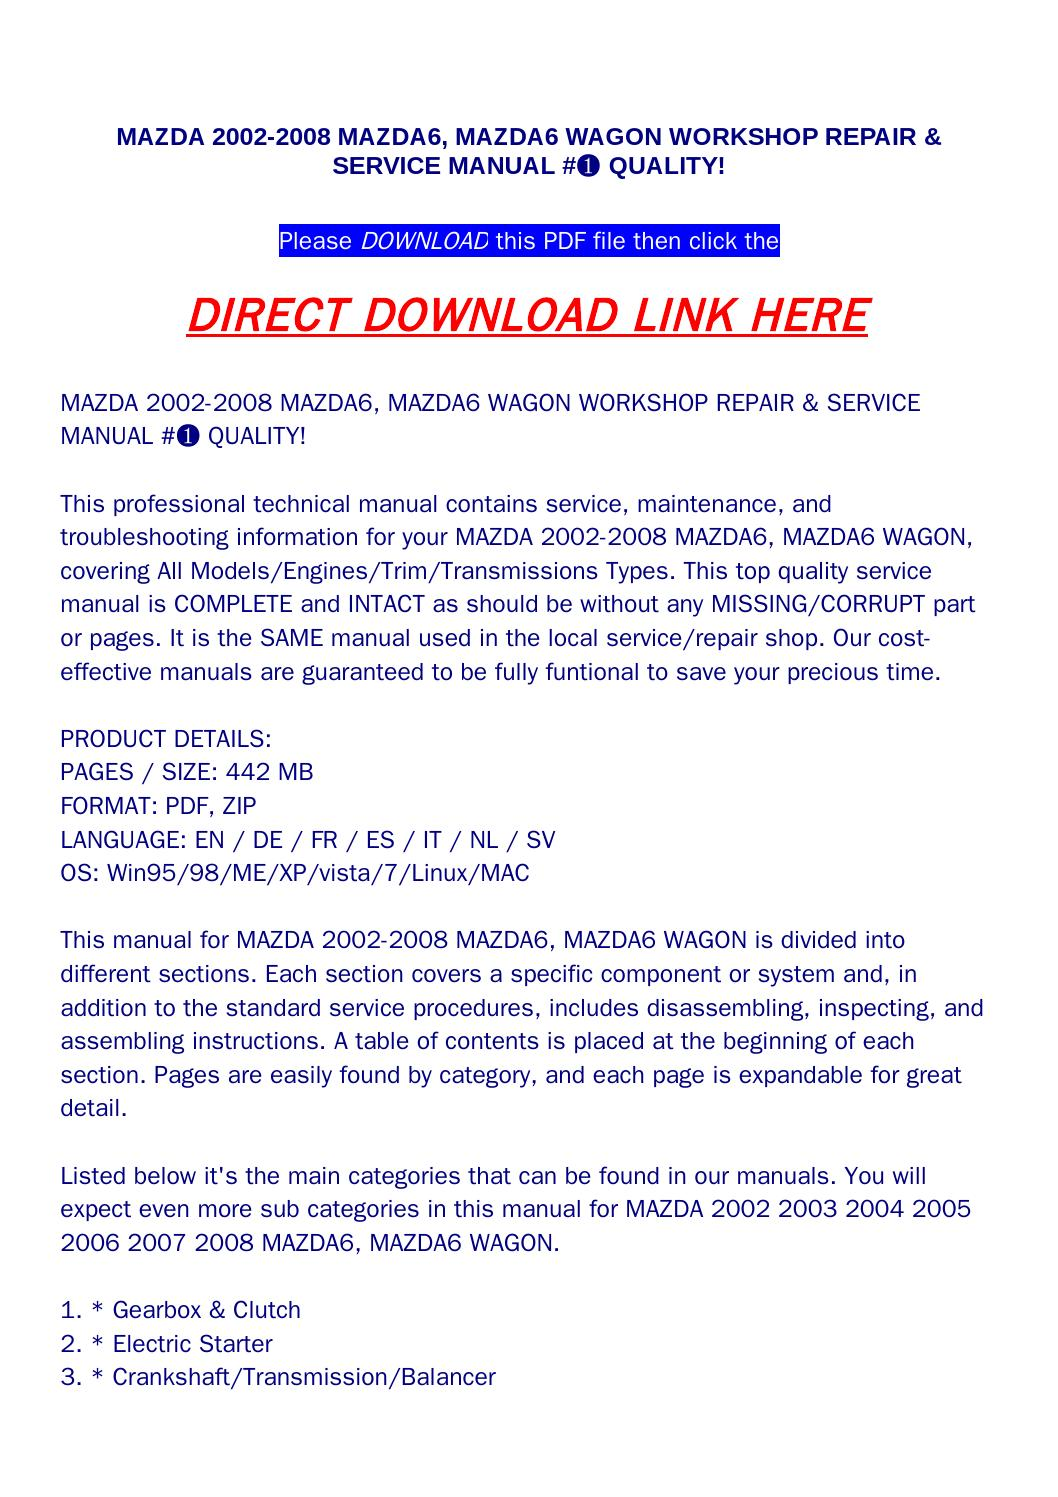 Mazda 2002 2008 mazda6, mazda6 wagon workshop repair & service manual #➀  quality! by bonus300 - issuu